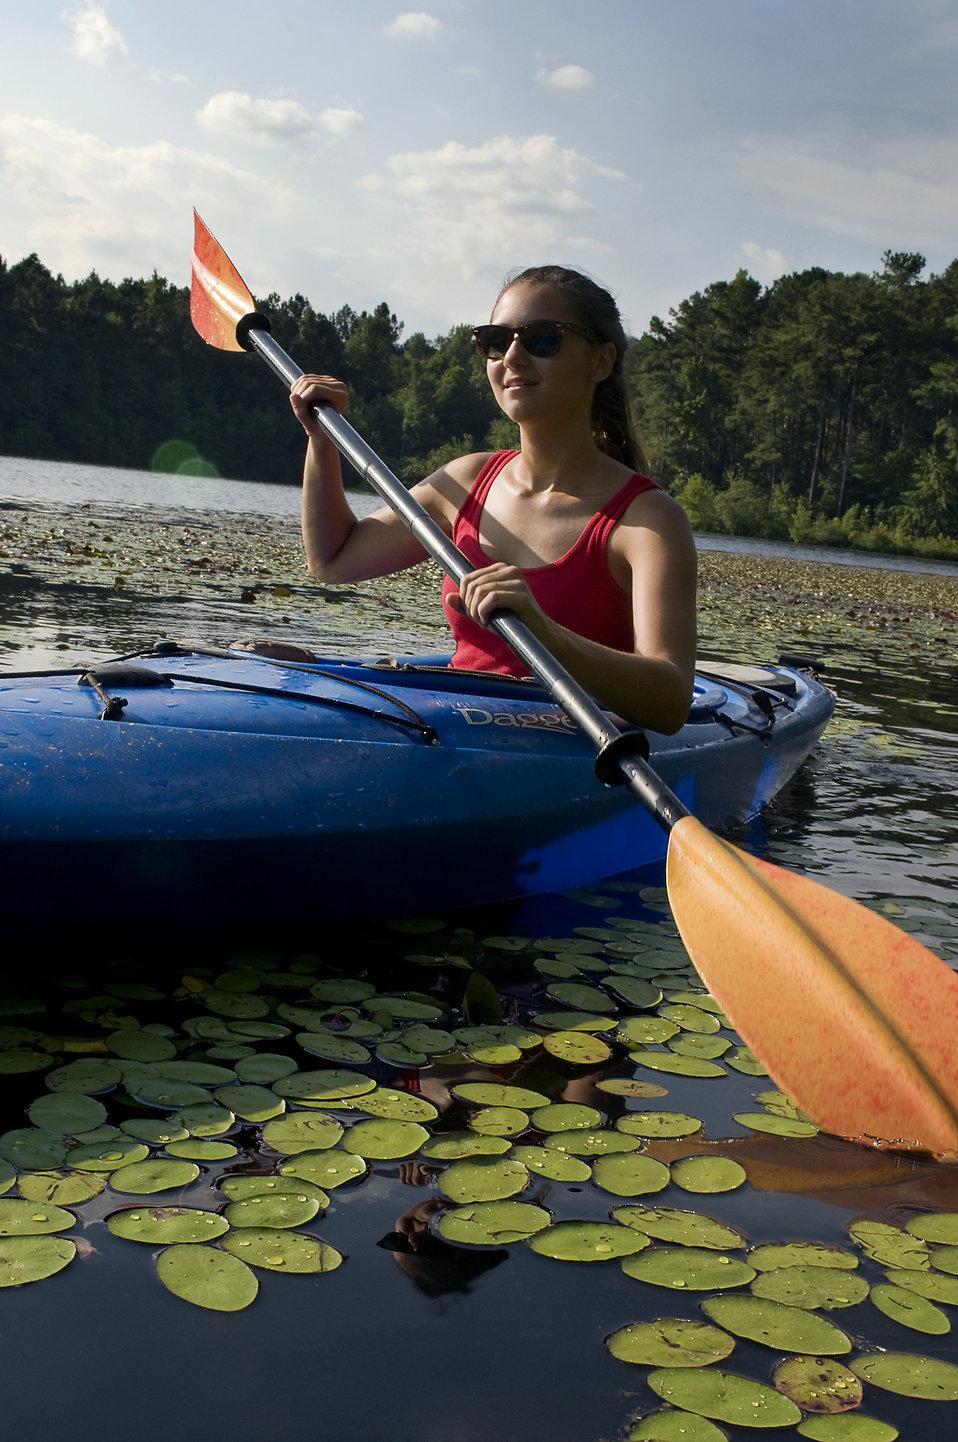 kayak free stock photo a young woman kayaking on a lake 16358